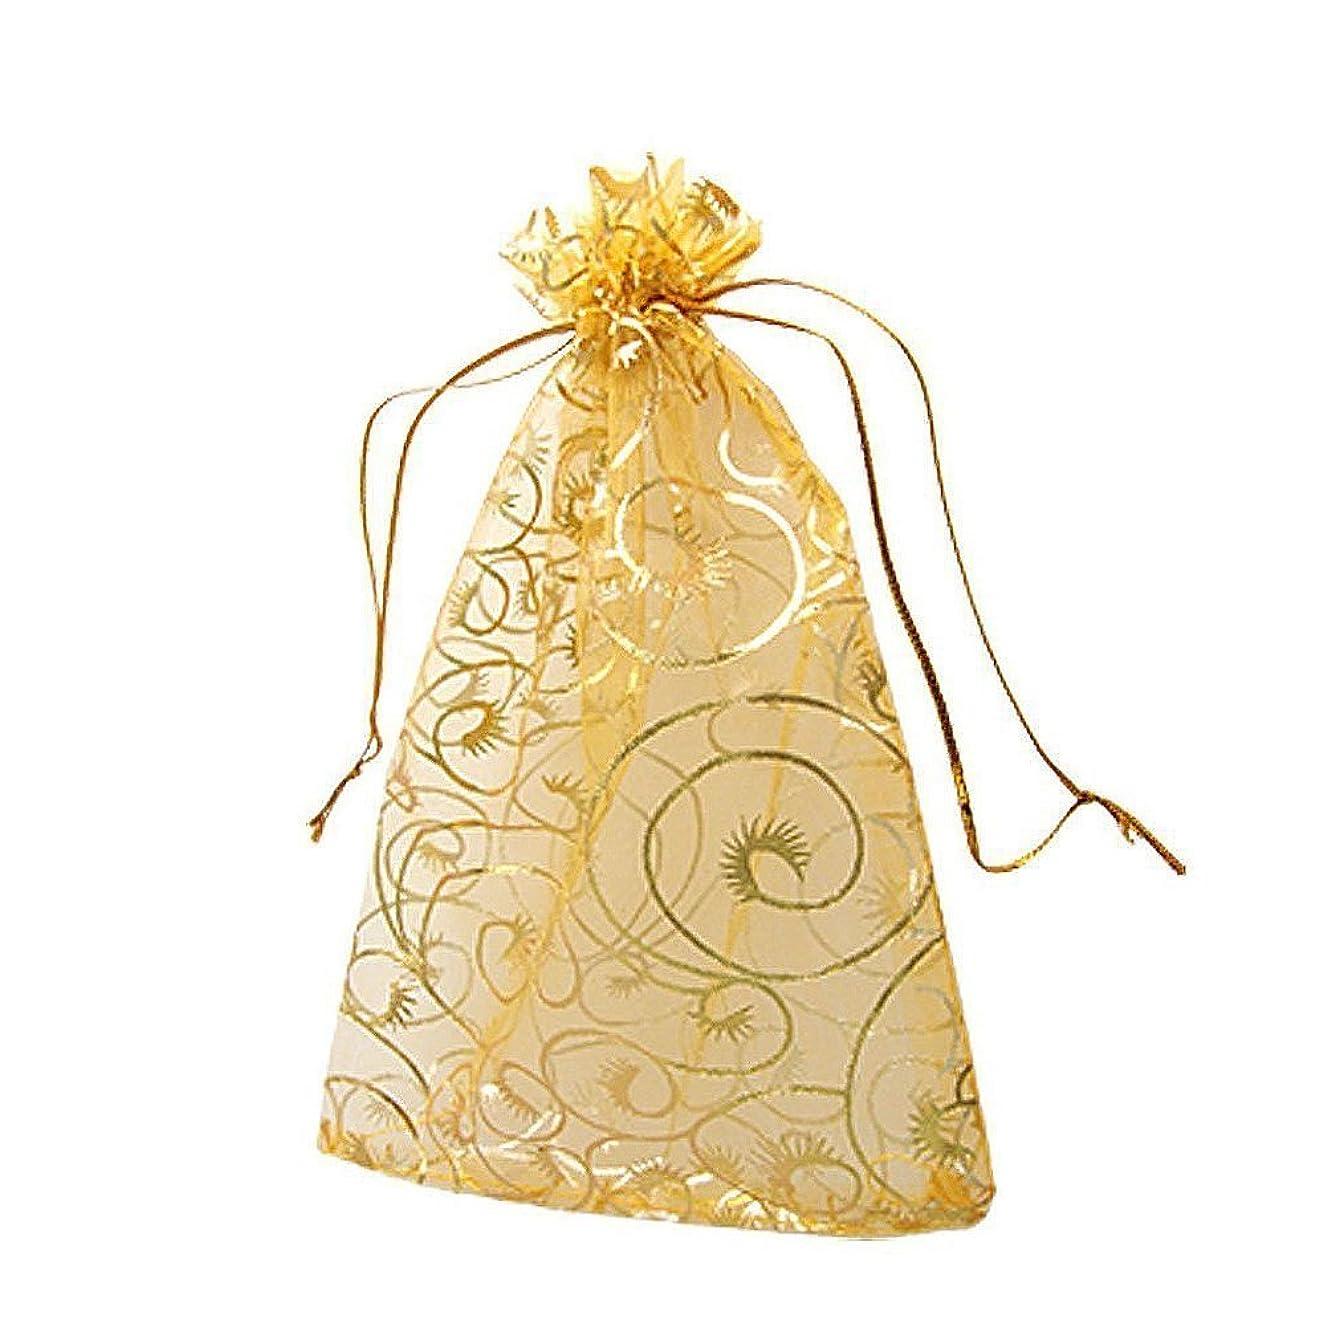 100pcs 3.9''x4.7'' Golden Champagne Eyelash Organza Drawstring Pouches Jewelry Party Wedding Favor Wedding Favor Gift Candy Bags by YYaaloa (3.9''x4.7'' Golden Champagne Eyelash)